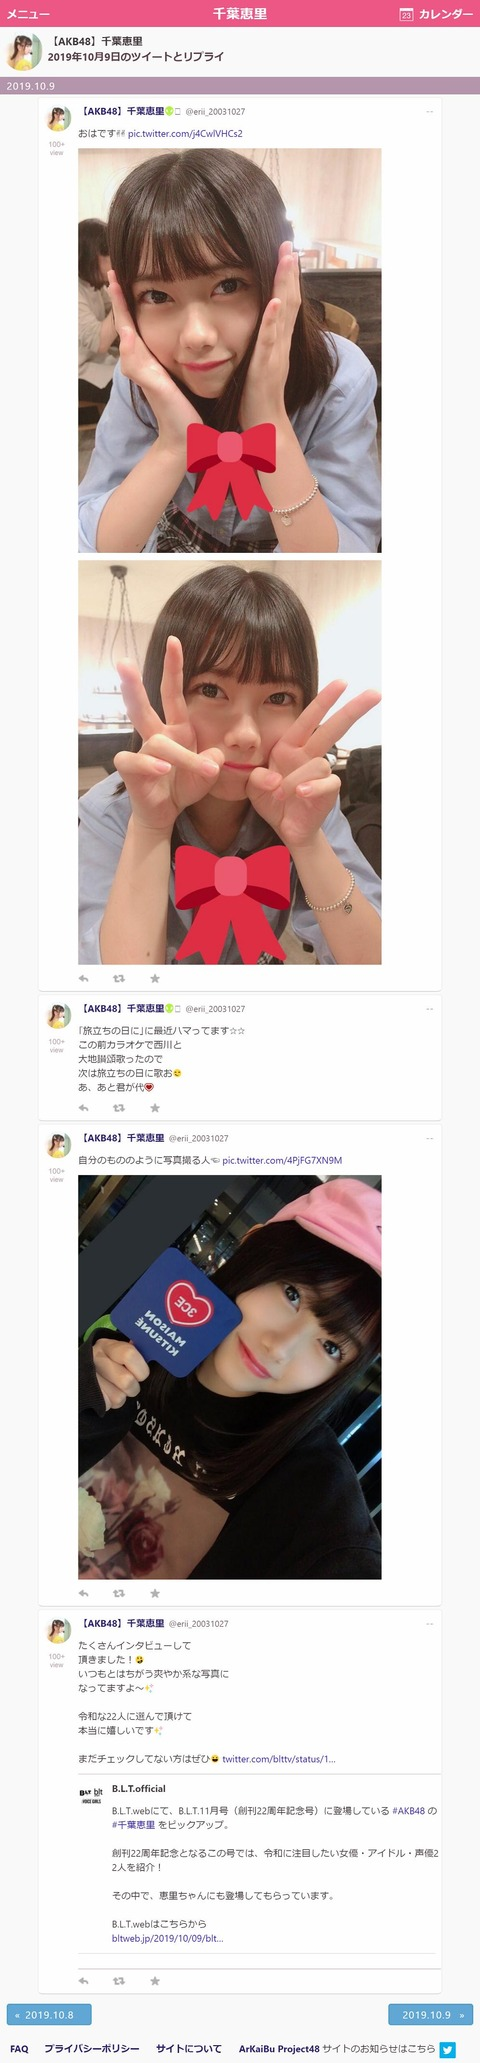 【AKB48】千葉恵里「カラオケで西川怜と君が代を歌いたい!」→数時間後、削除www